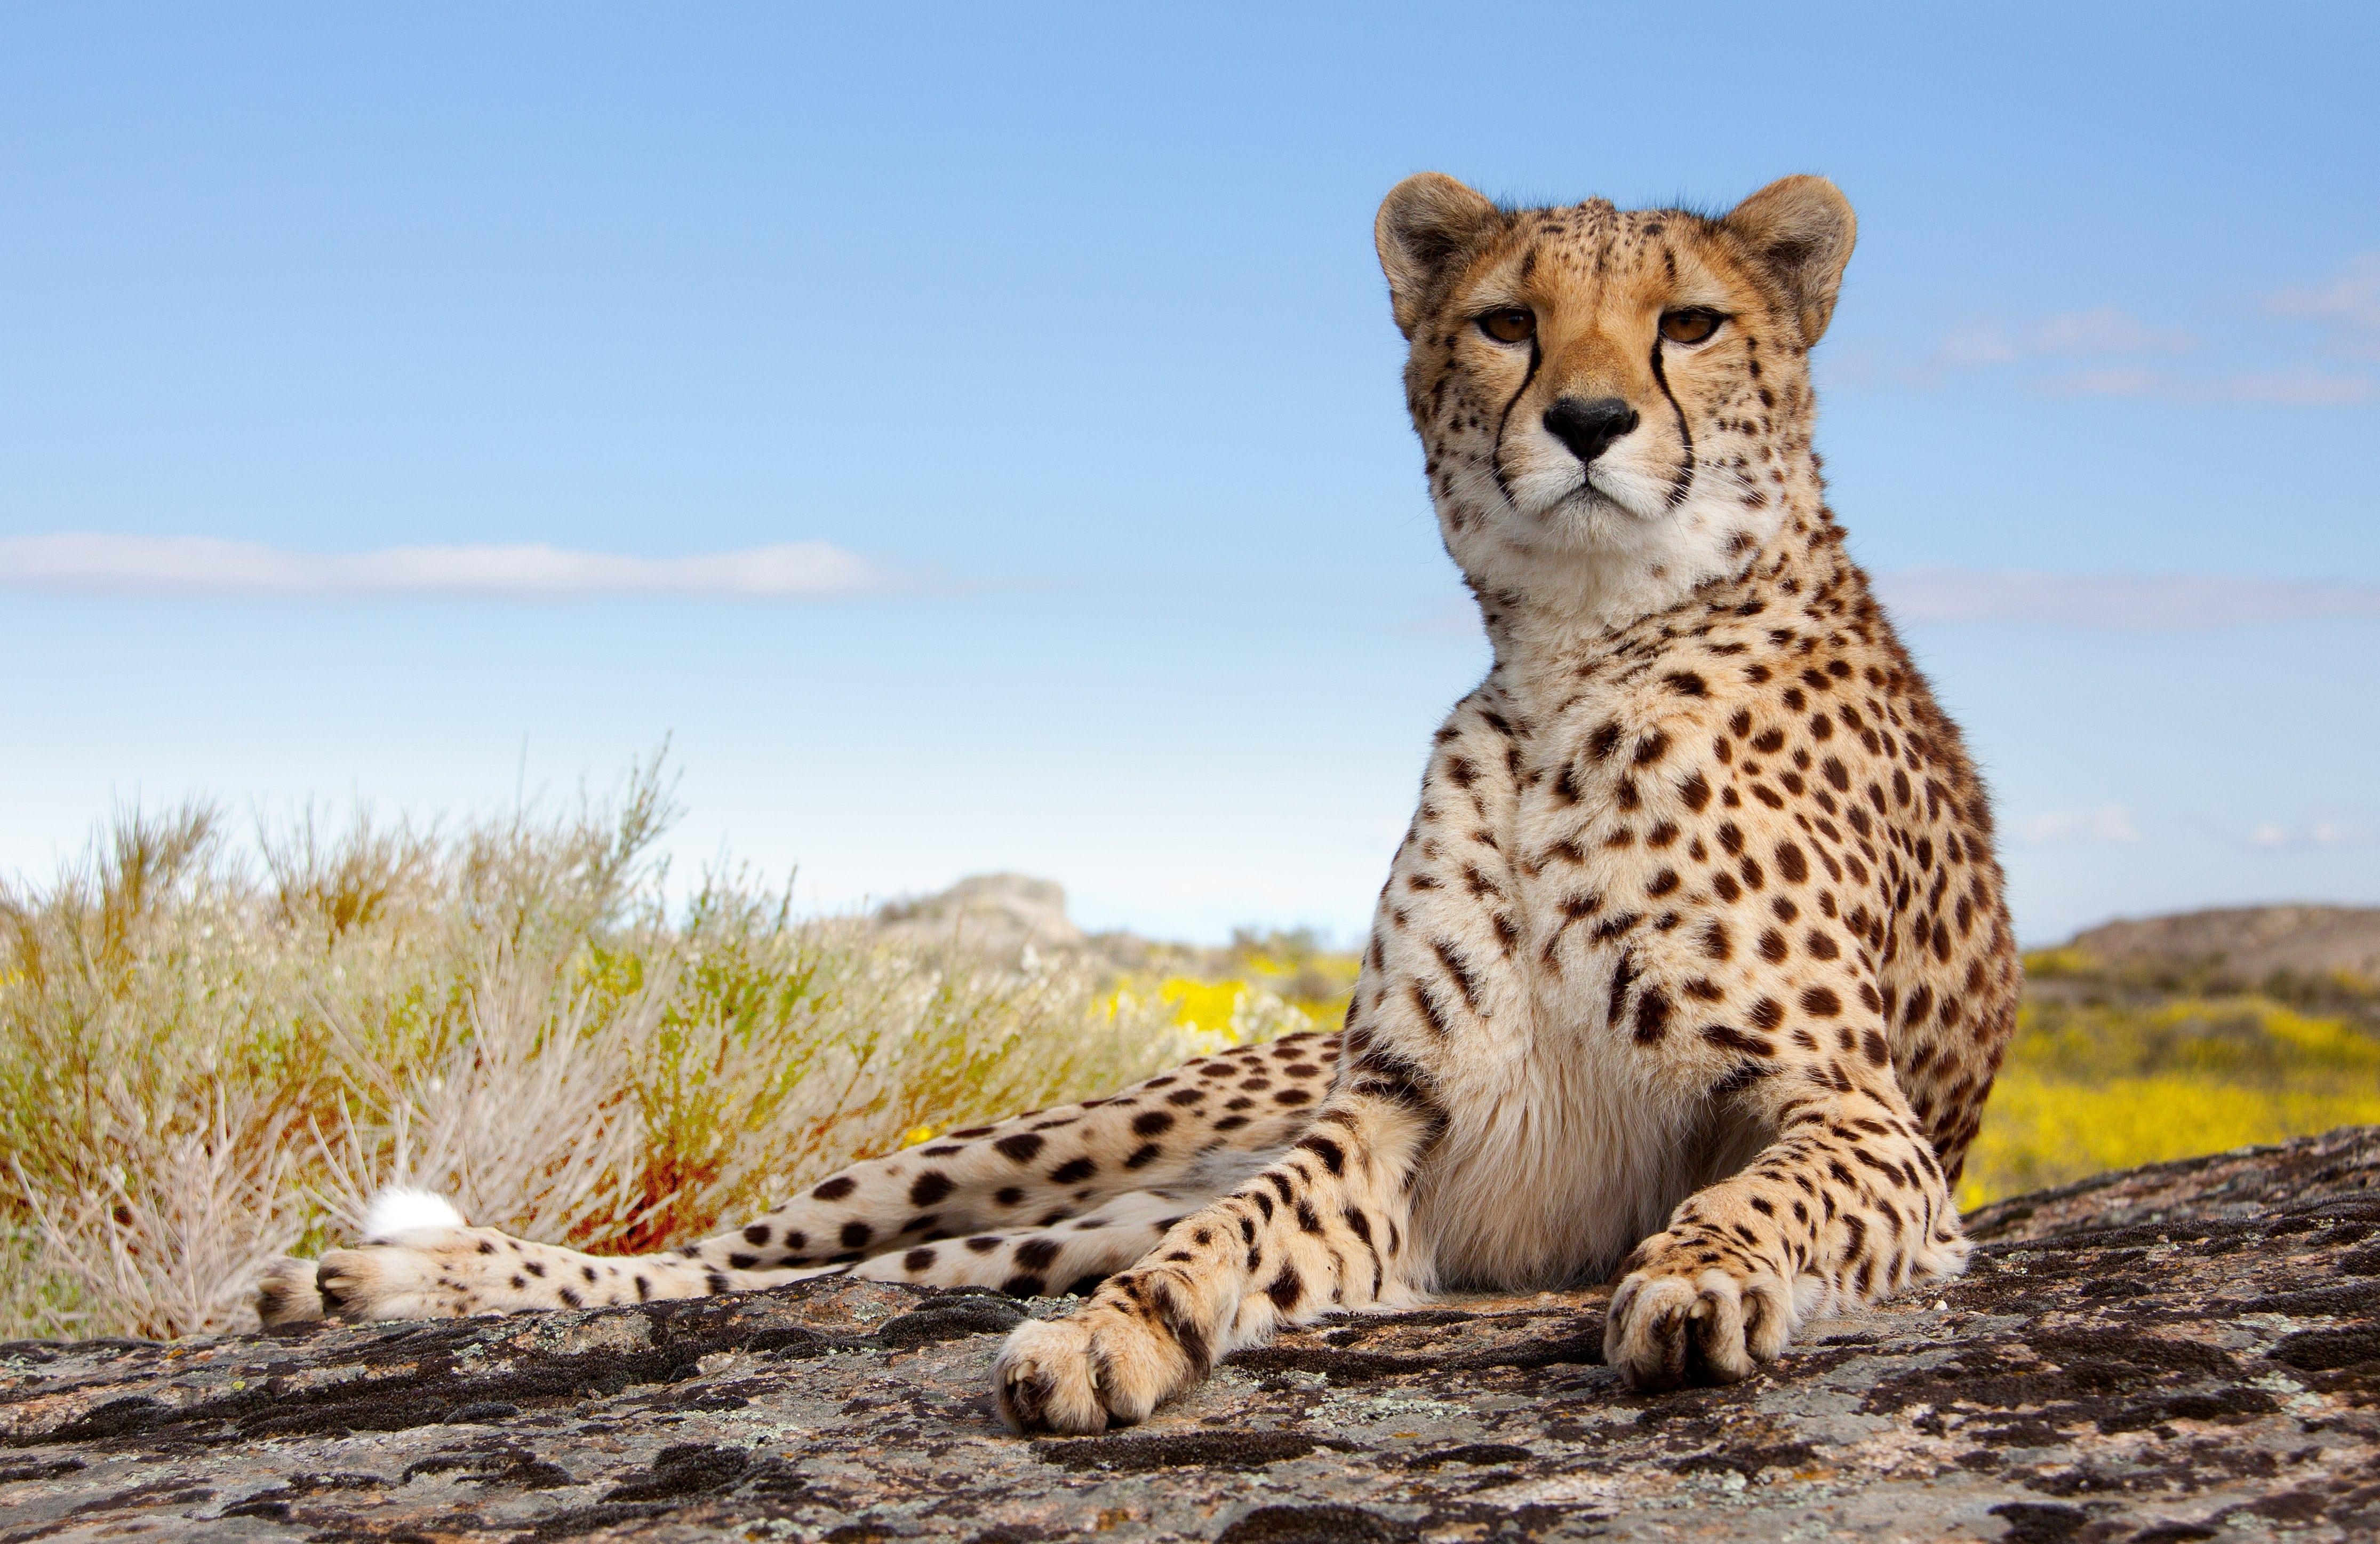 Resting but vigilant cheetah looks straight at observer